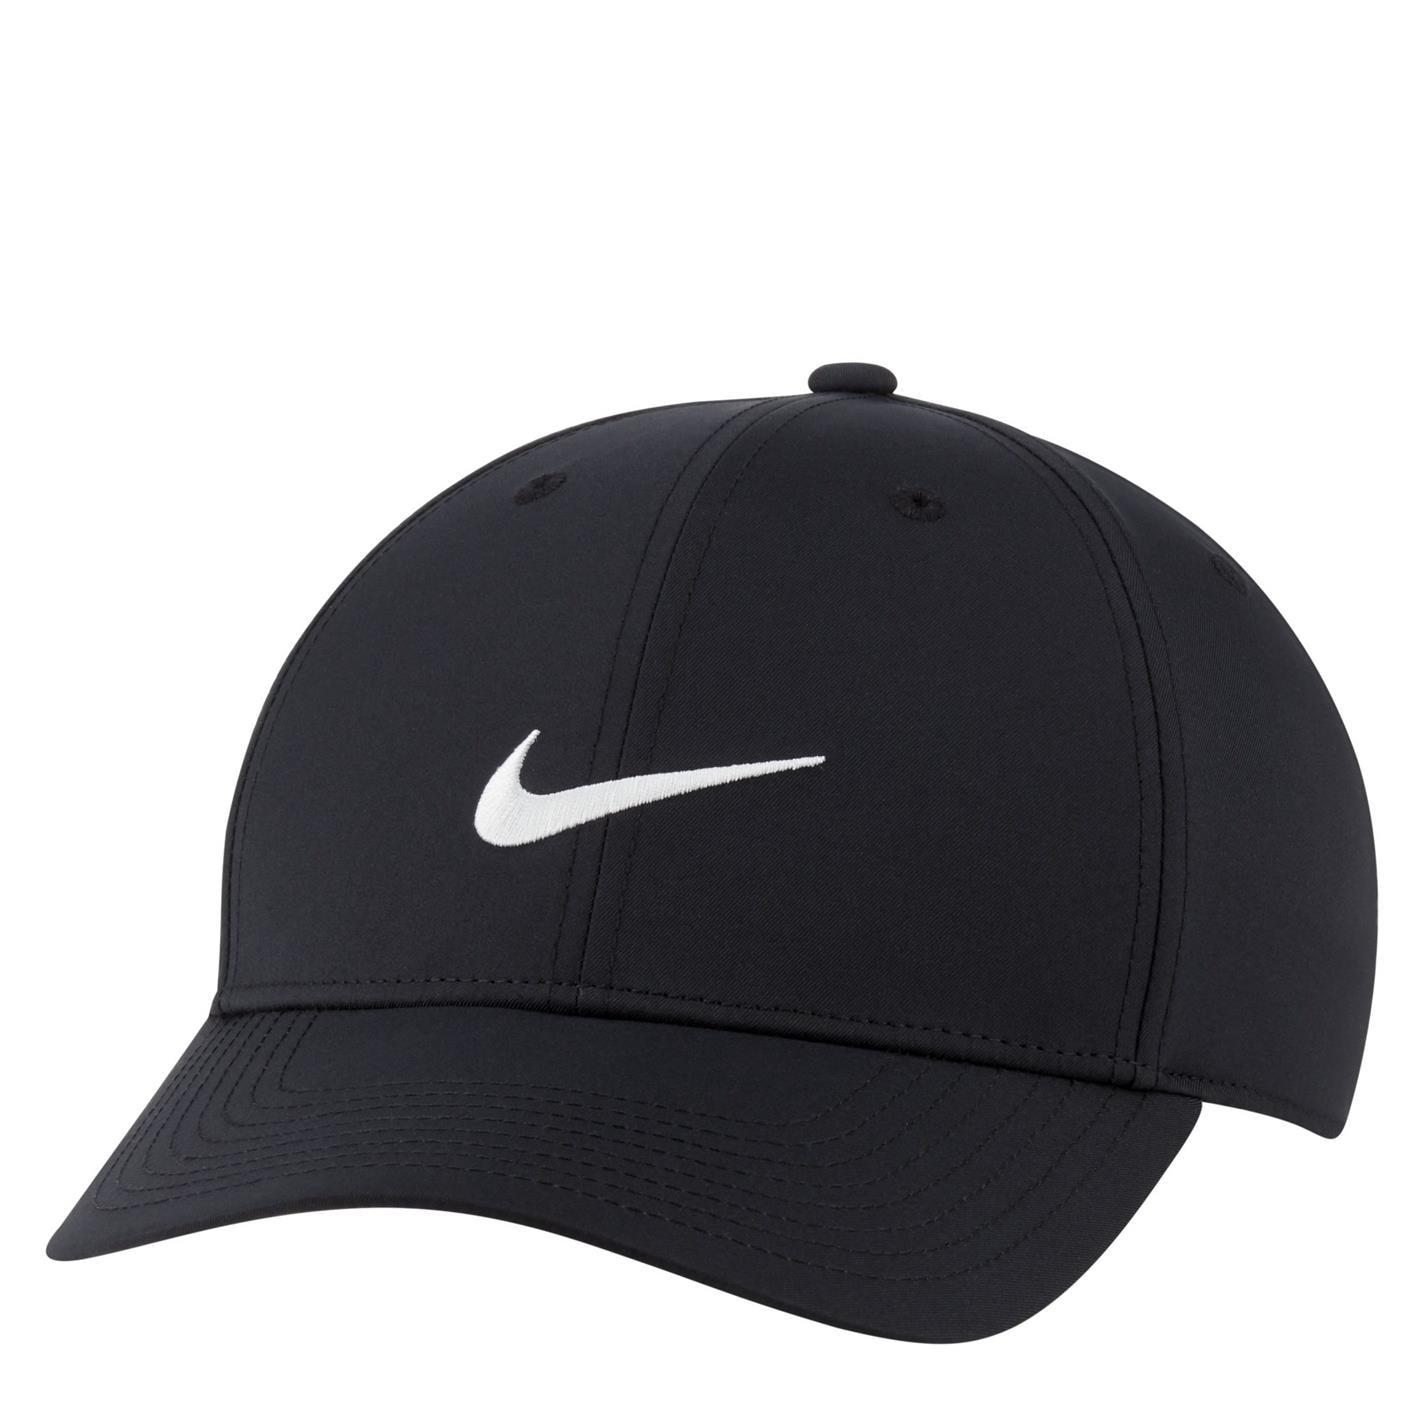 Nike Legacy 91 Tech Swoosh Cap Unisex Black ba5156996b3